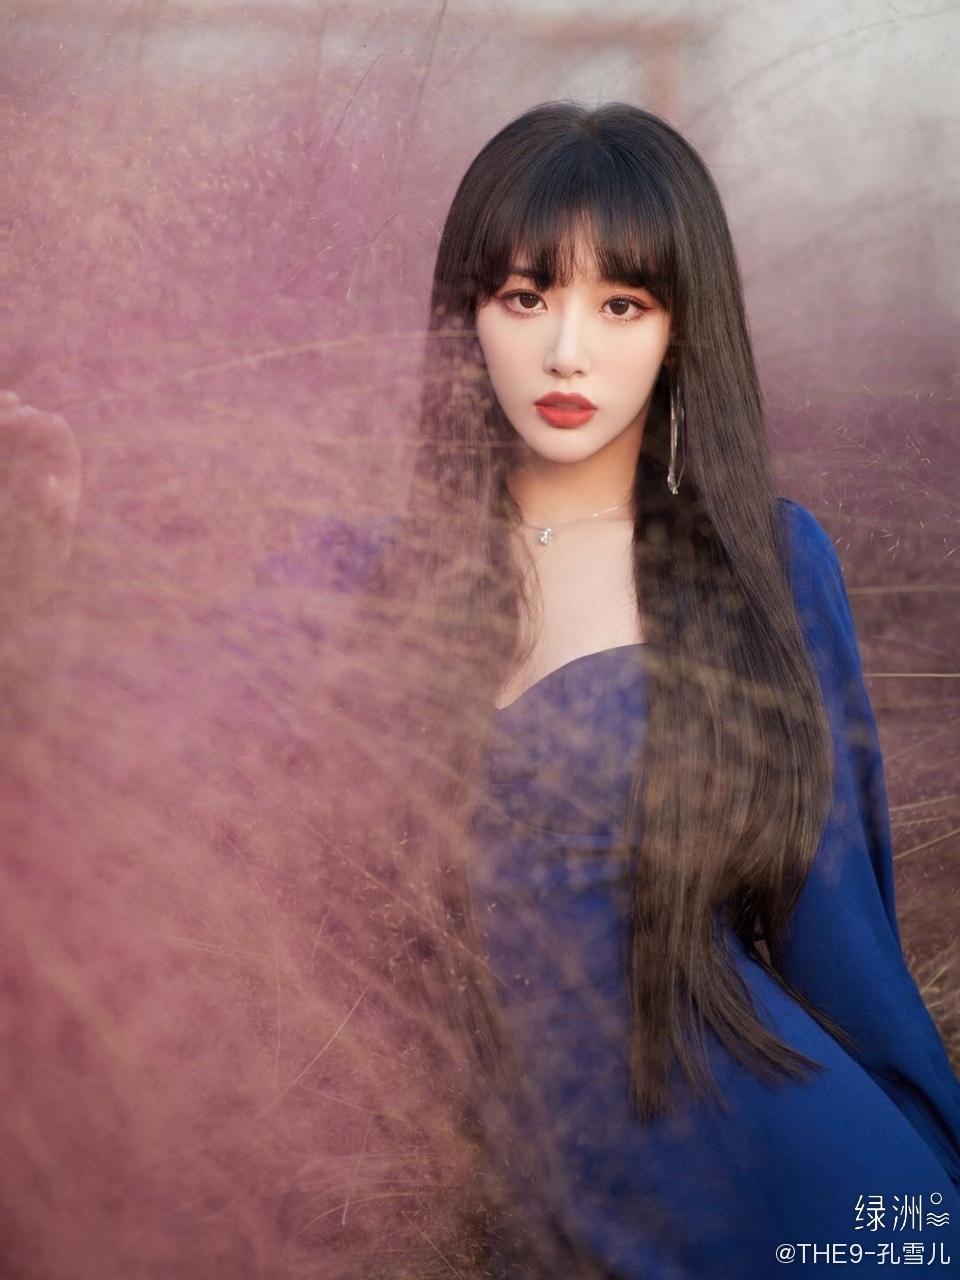 Irene事件延燒!THE9孔雪兒被掀「曾遭JYP開除」內幕 網掀論戰